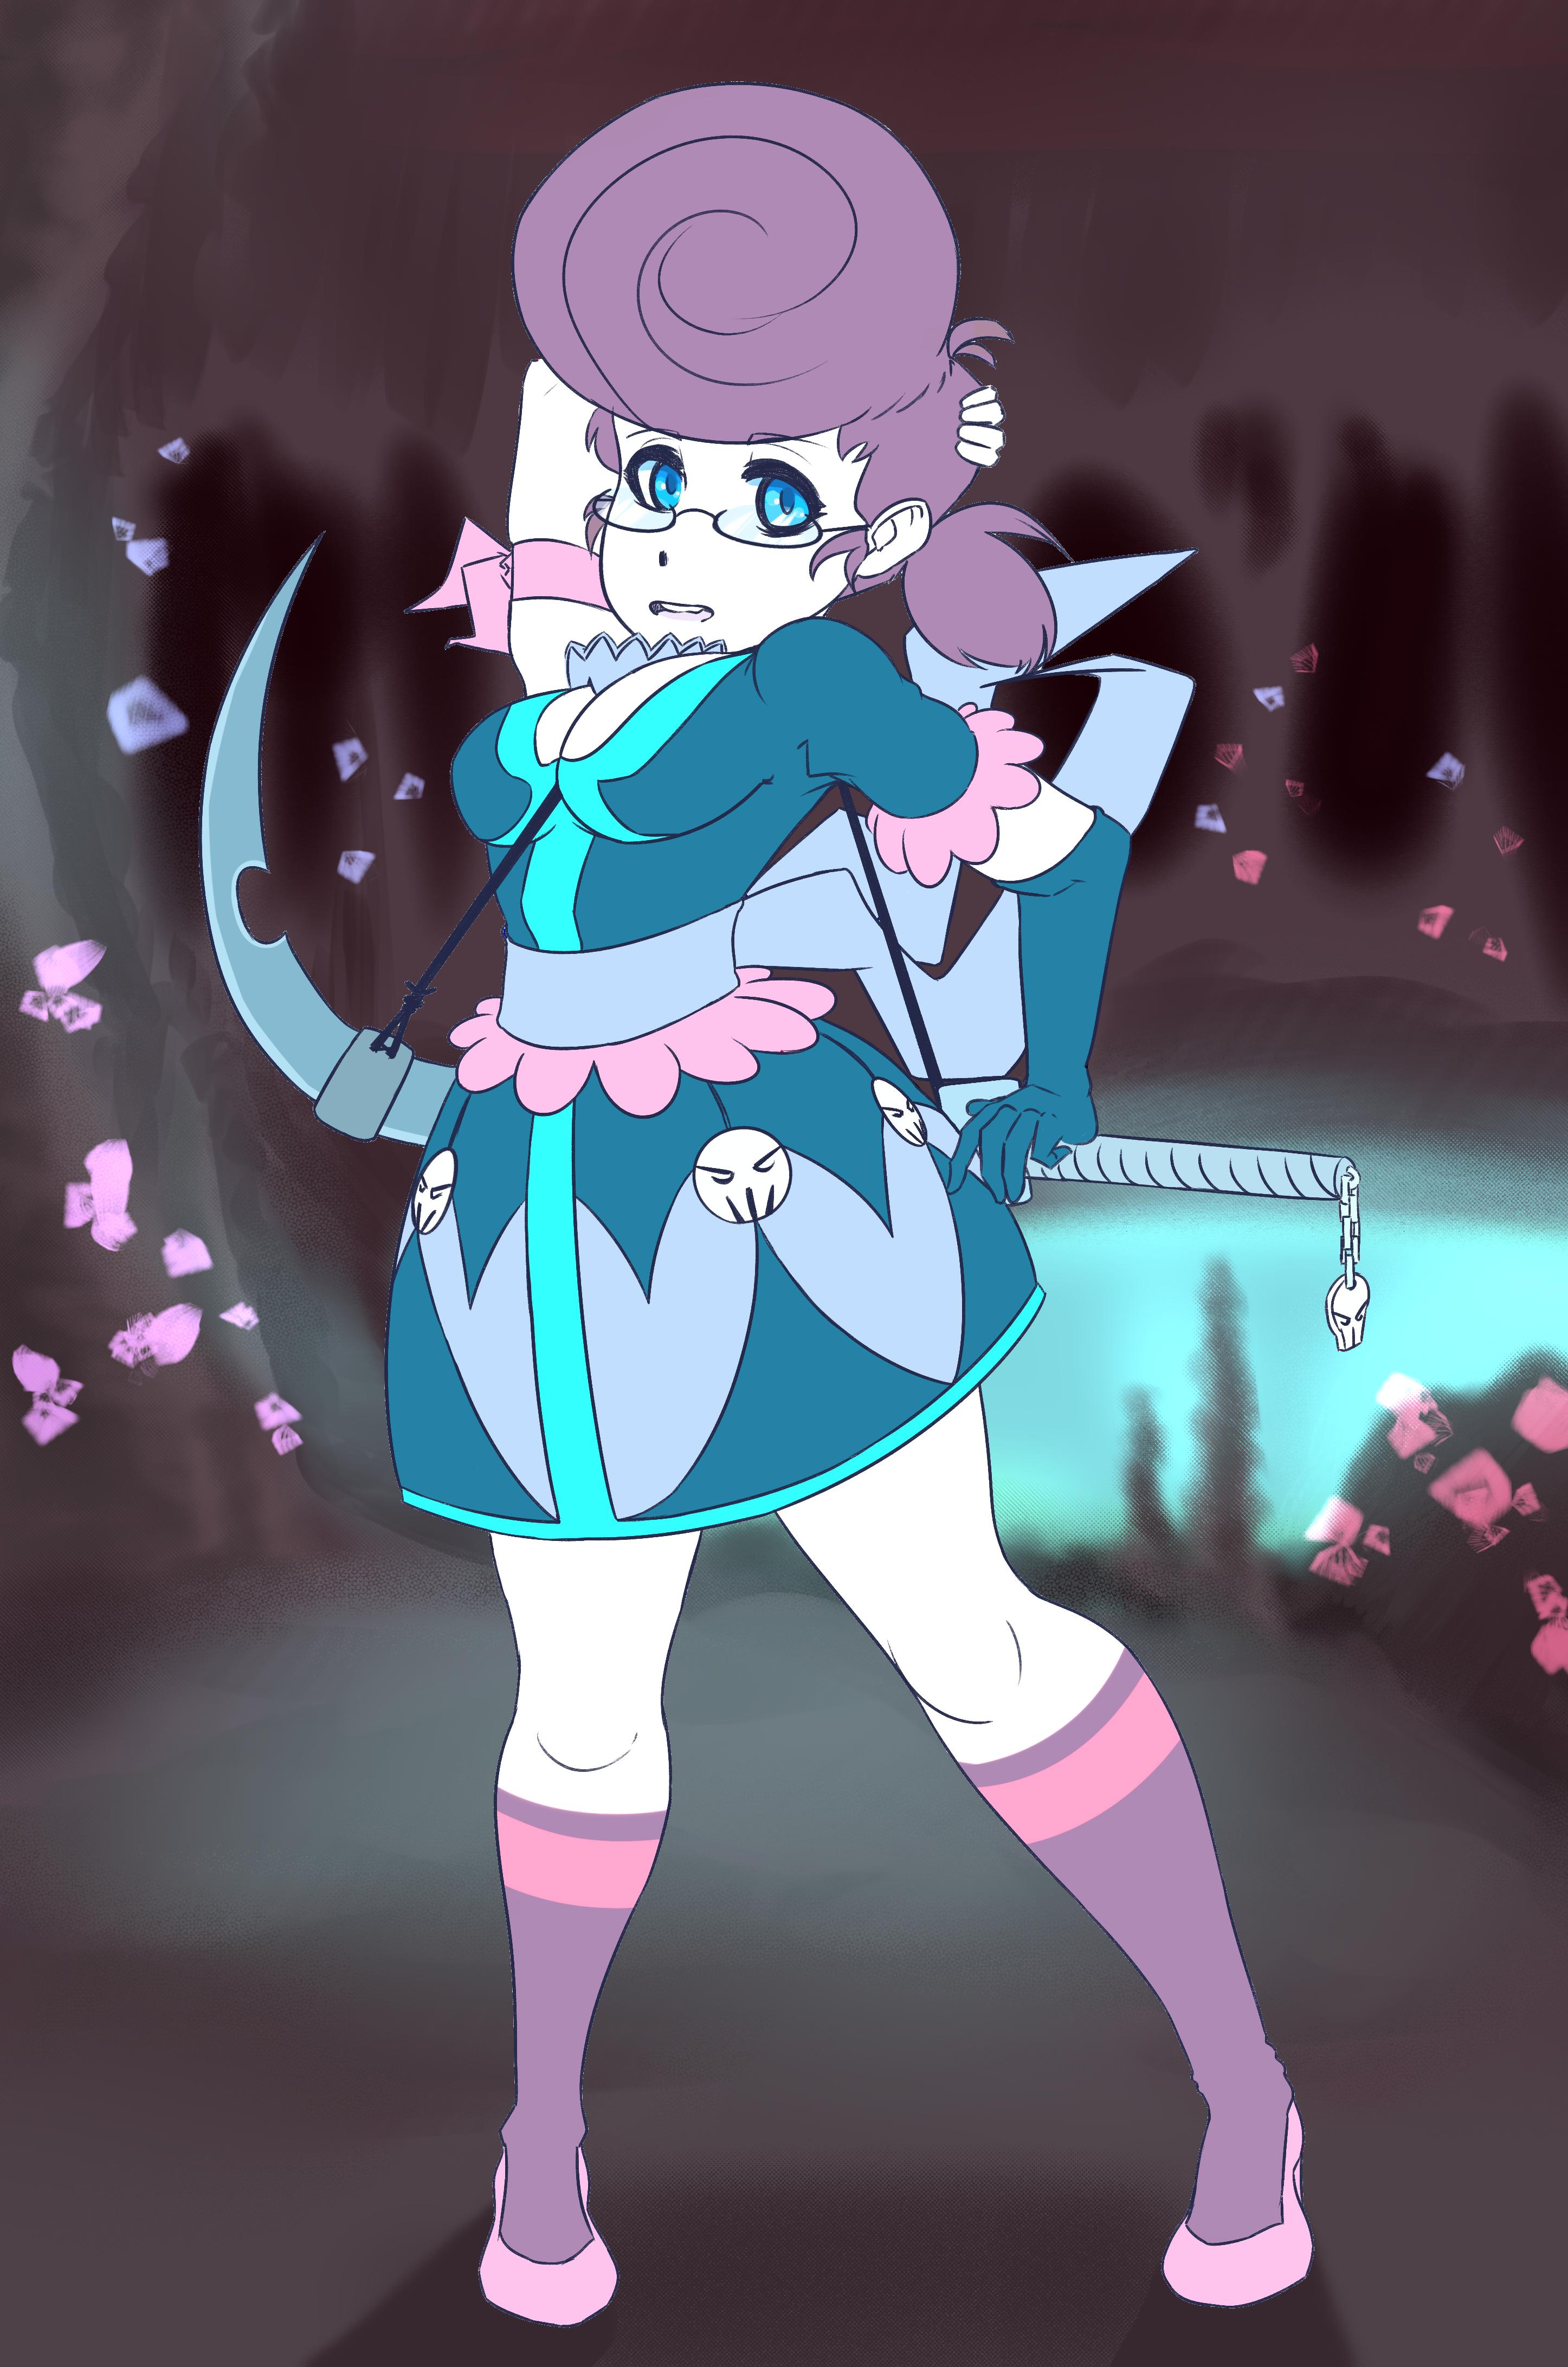 Magic Sword Girl